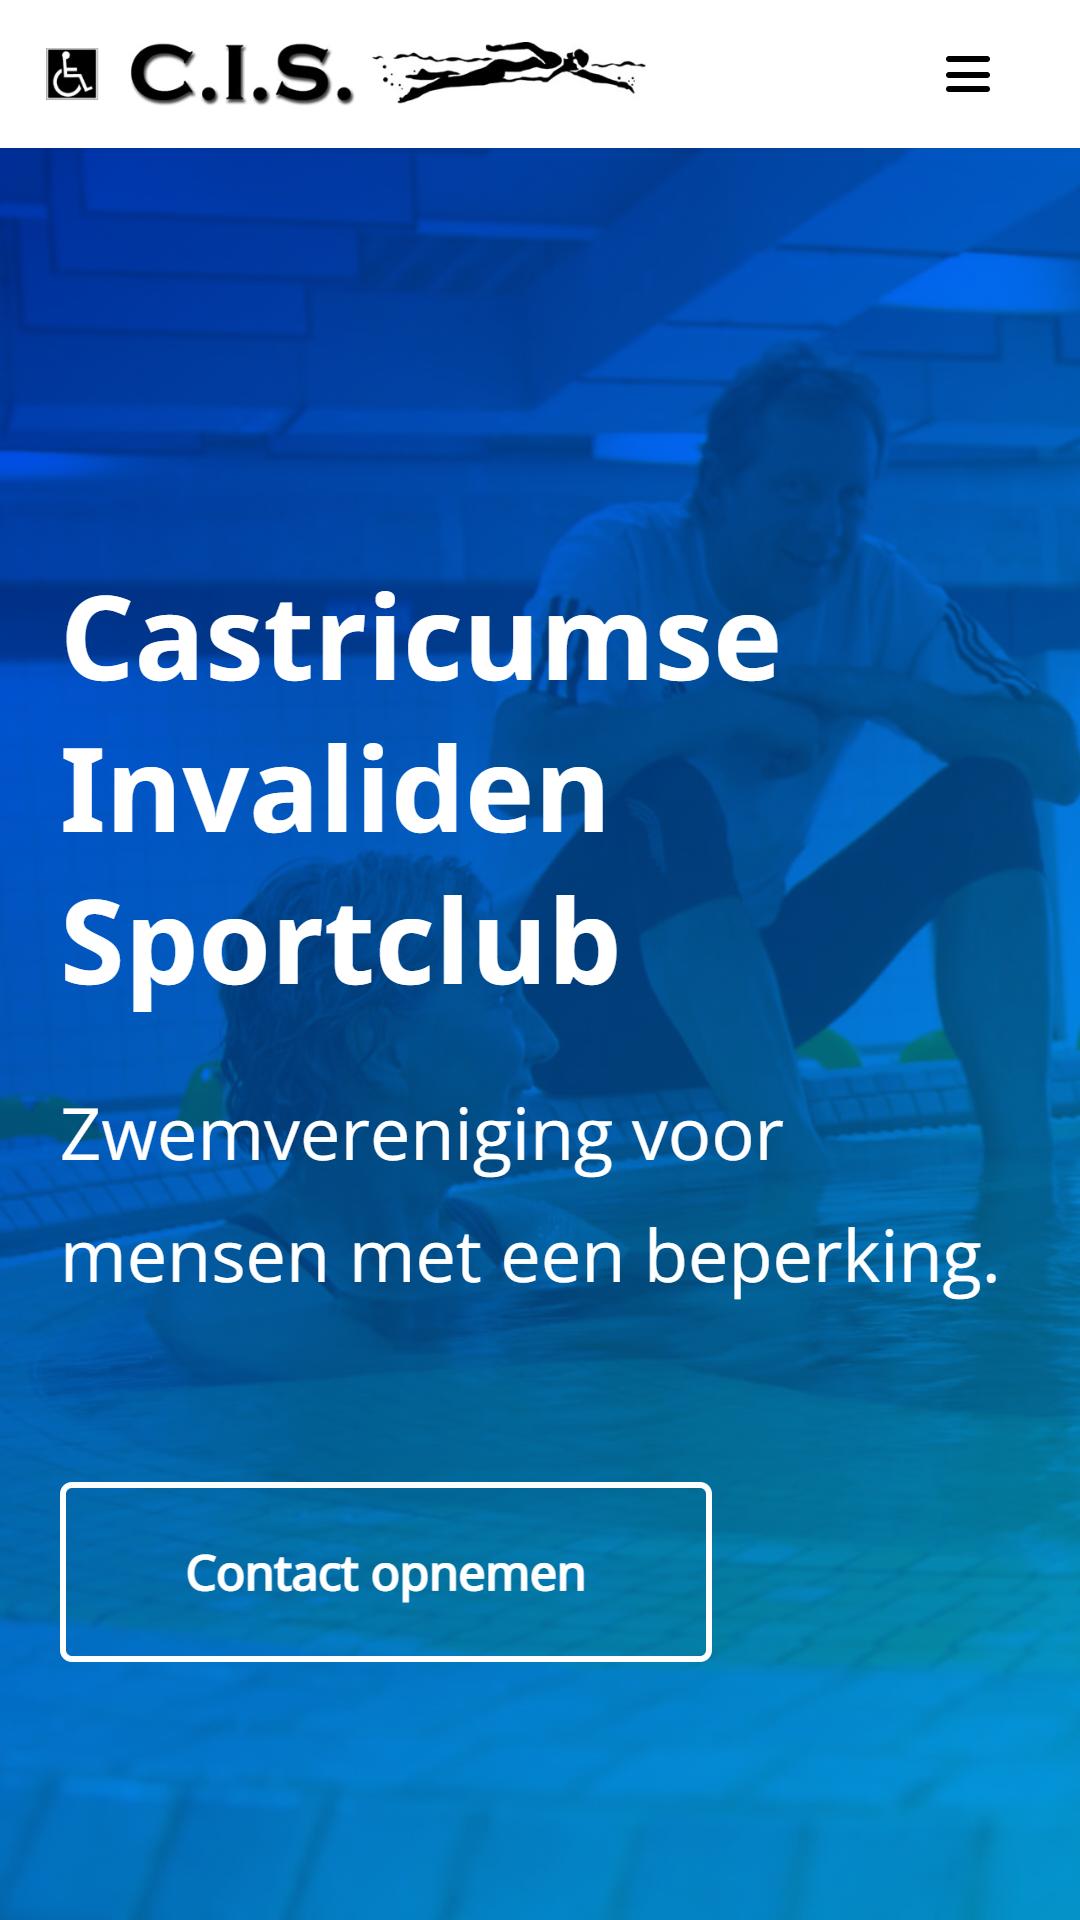 Zwemvereniging C.I.S. - After - Mobielweergave